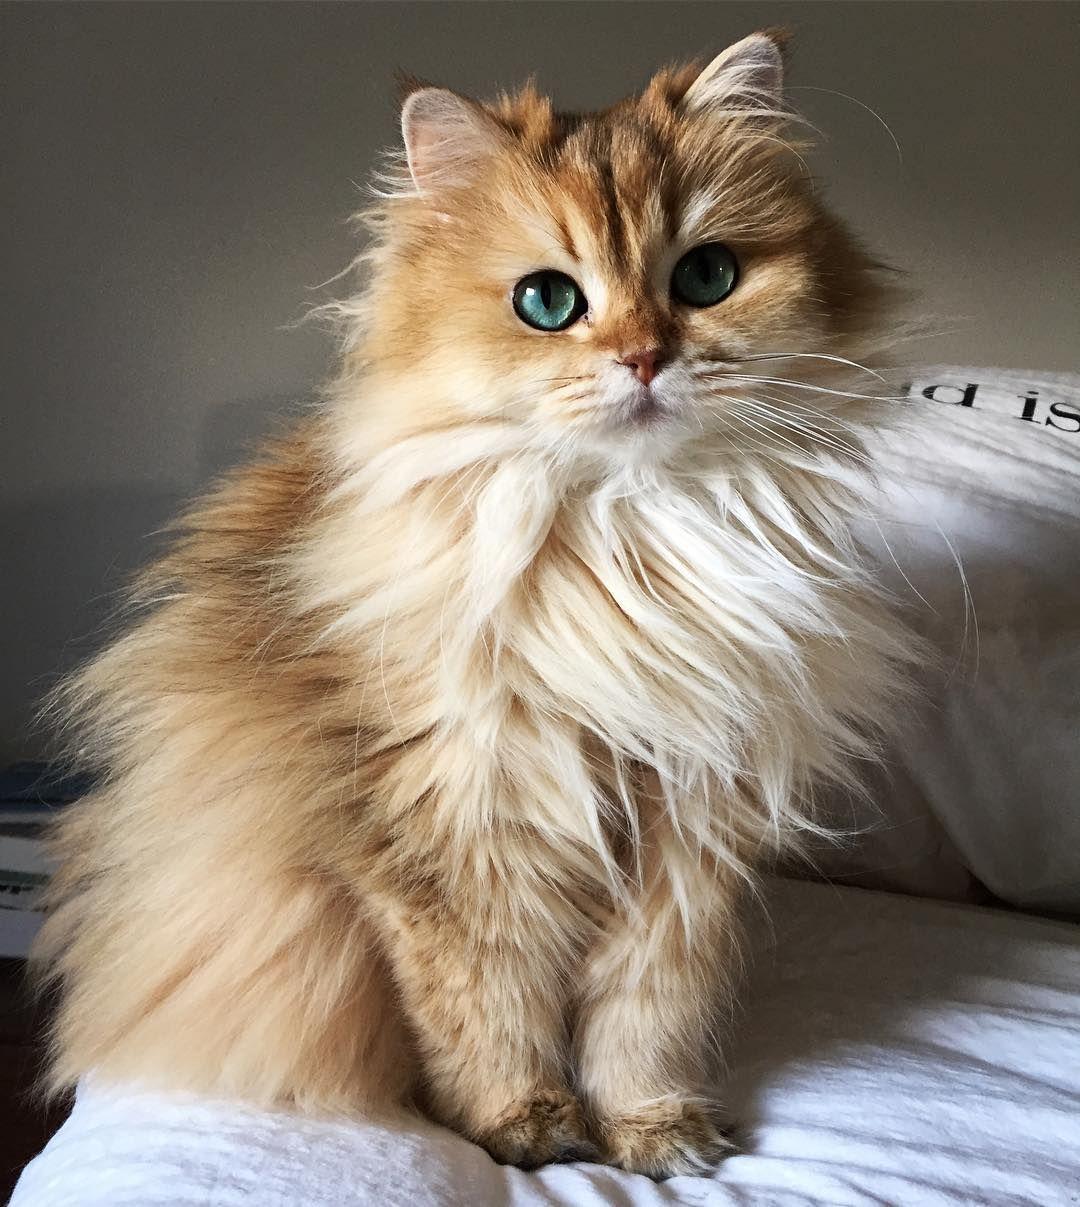 Pin by sally on ღ cute animals ღ Cute cats, Beautiful